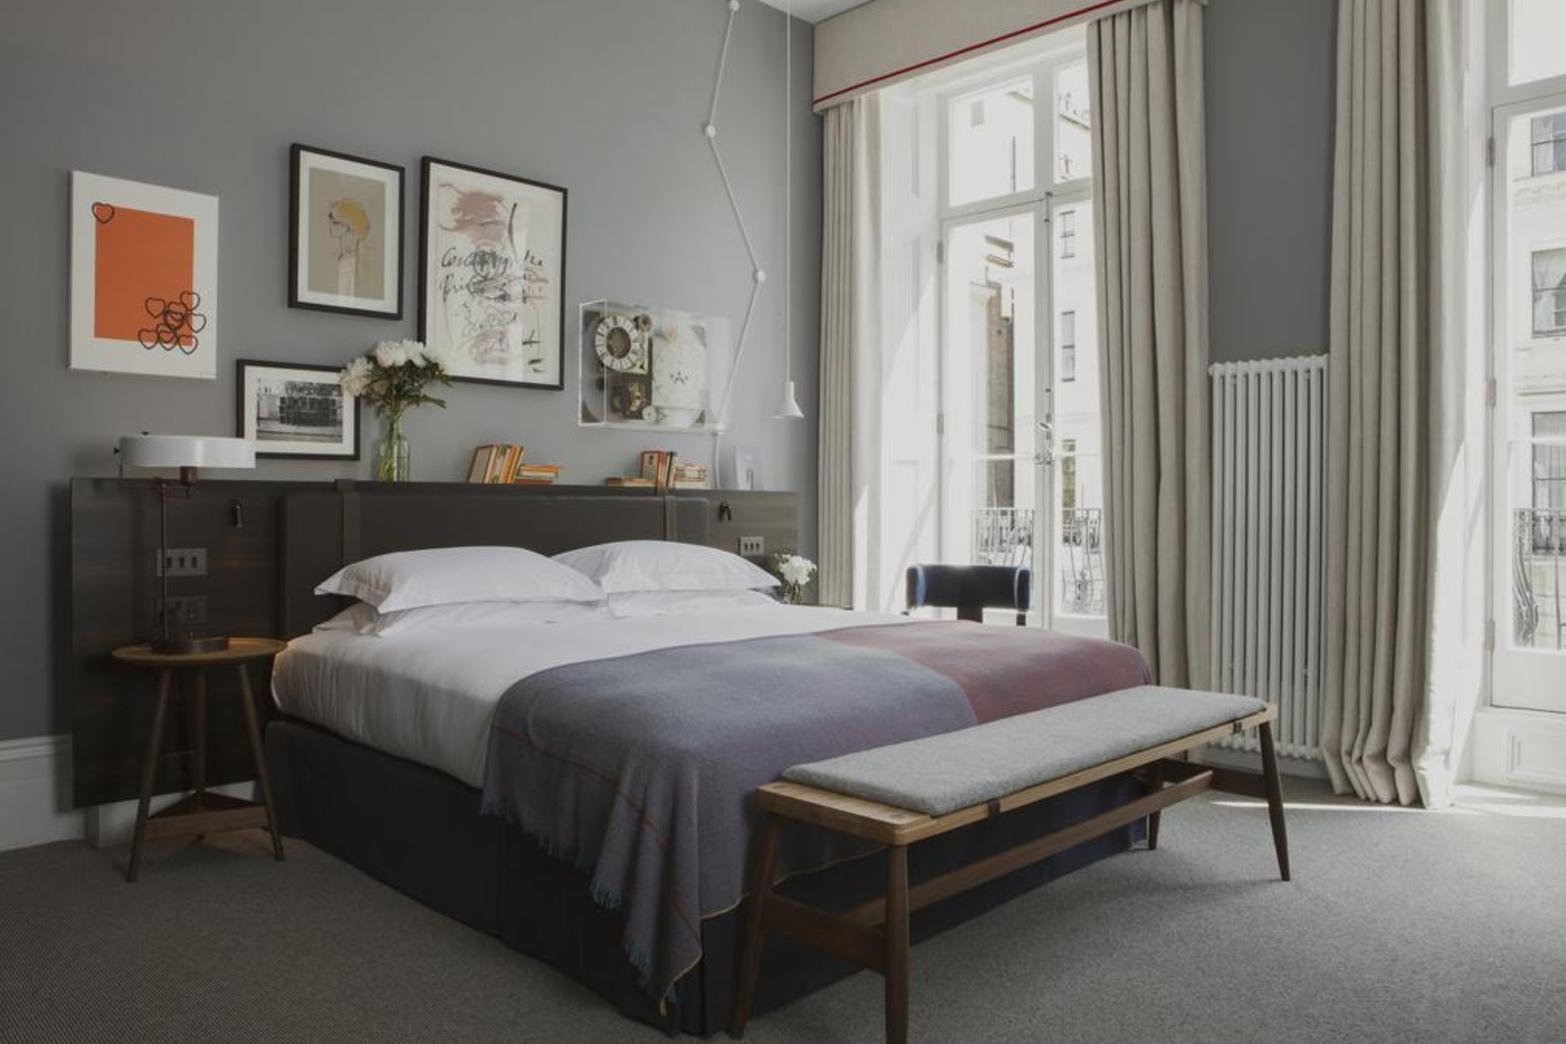 The Laslett Hotel Bedroom.png